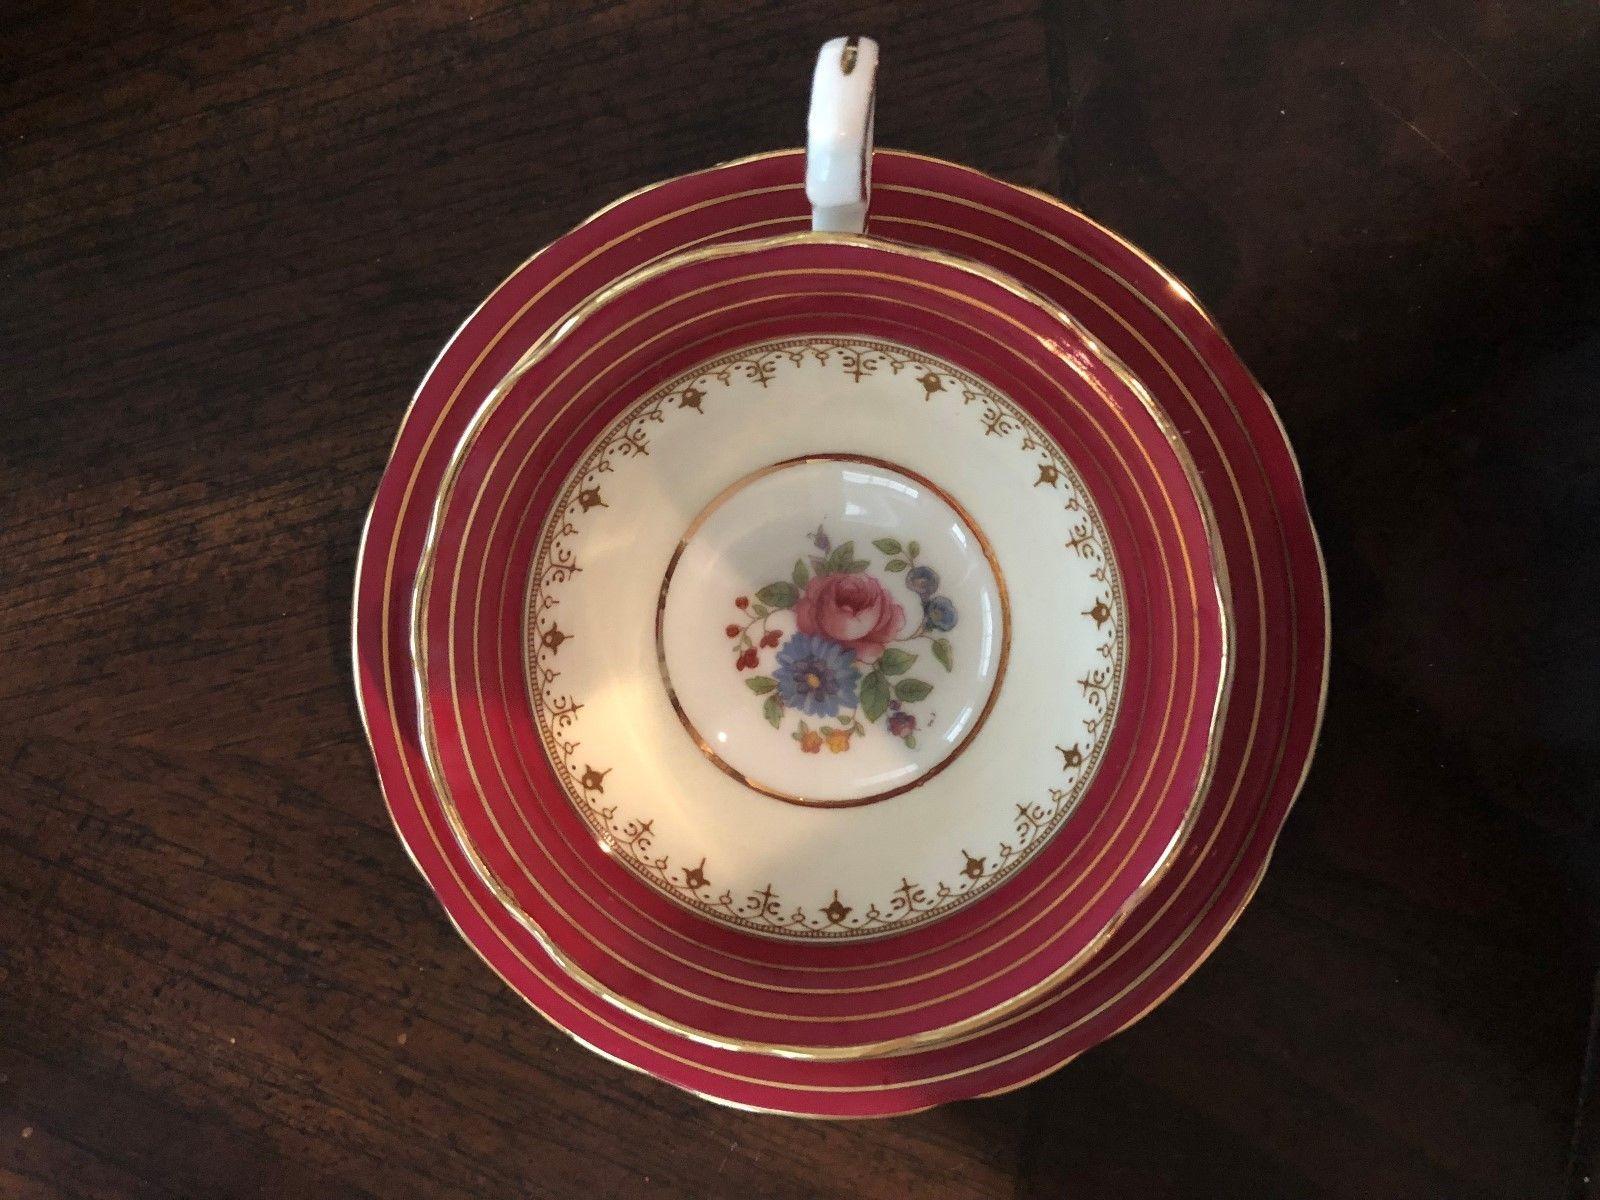 Vintage MINT Con. AYNSLEY Saucer & Tea Cup DORCHESTER 7499 Bone China England